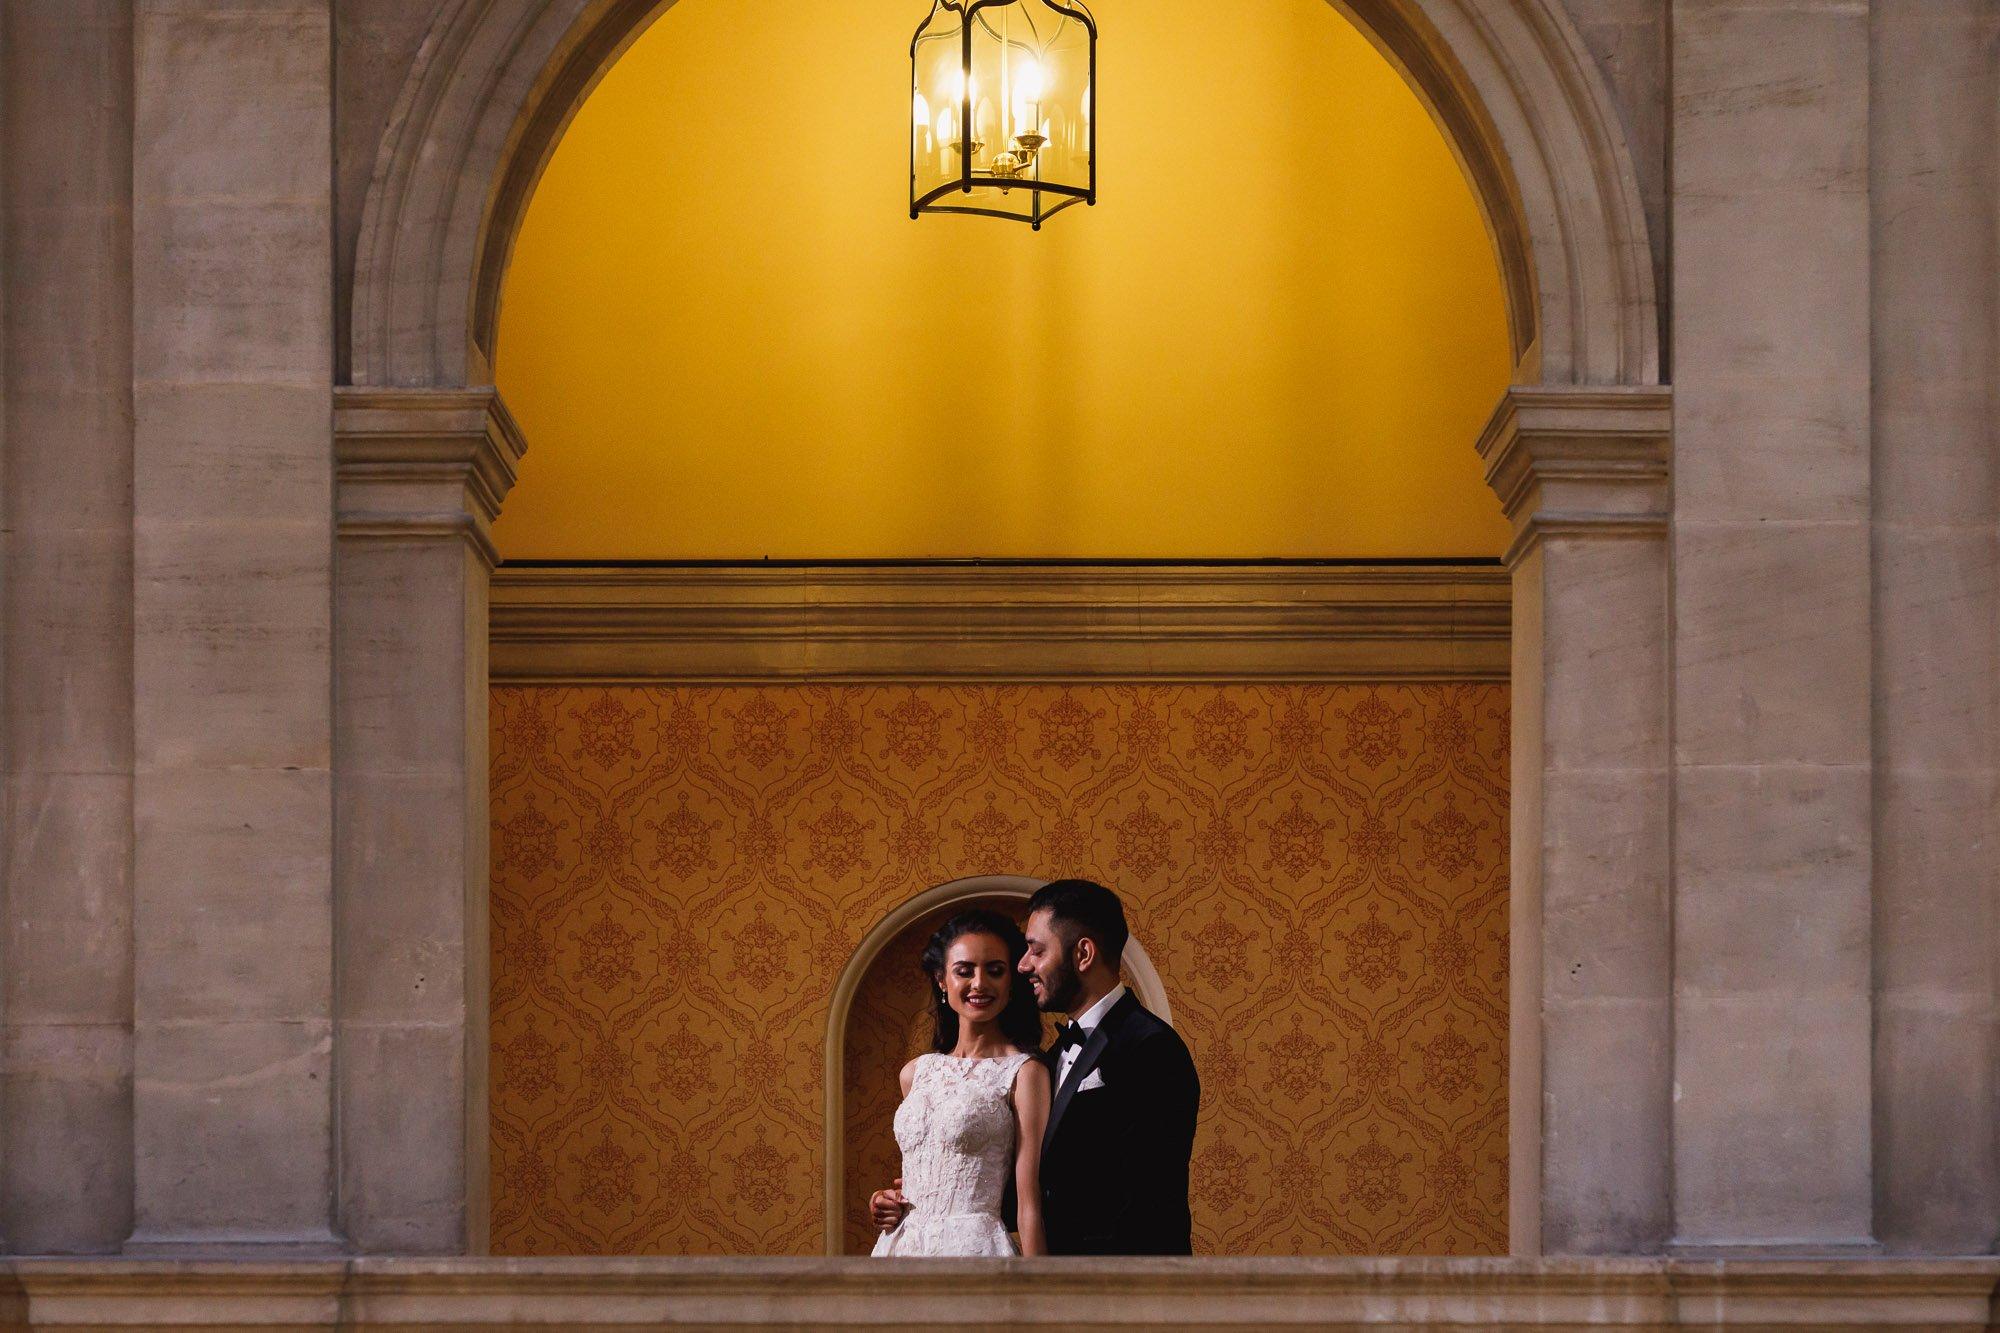 Heythrop Park Hotel, Oxfordshire, couples portraits